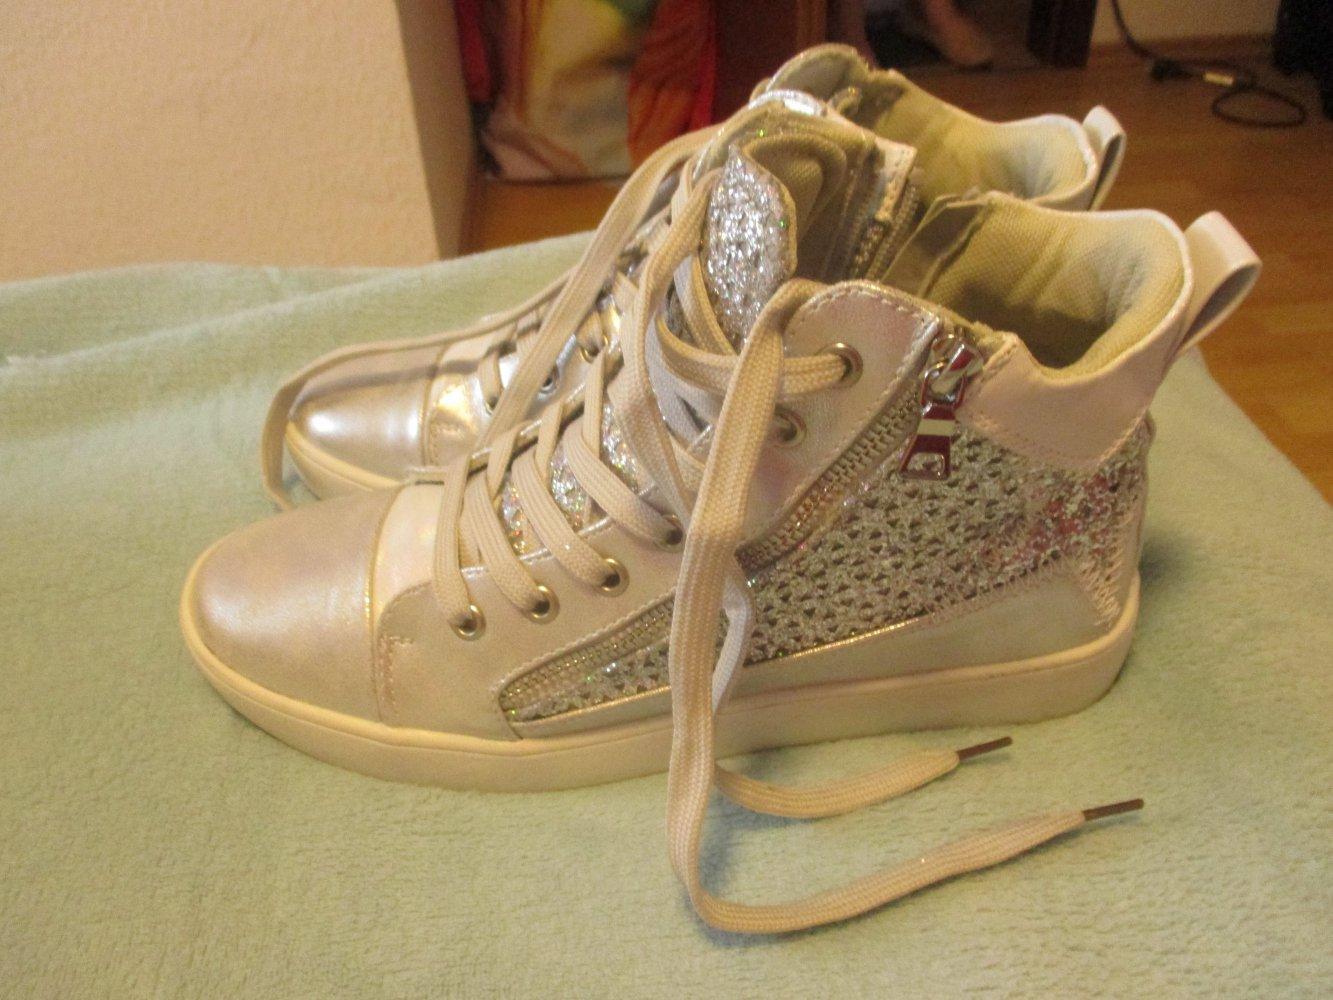 Herbst Frühling Damen Schuhe Nike Laufschuh ZOOM SPAN 2